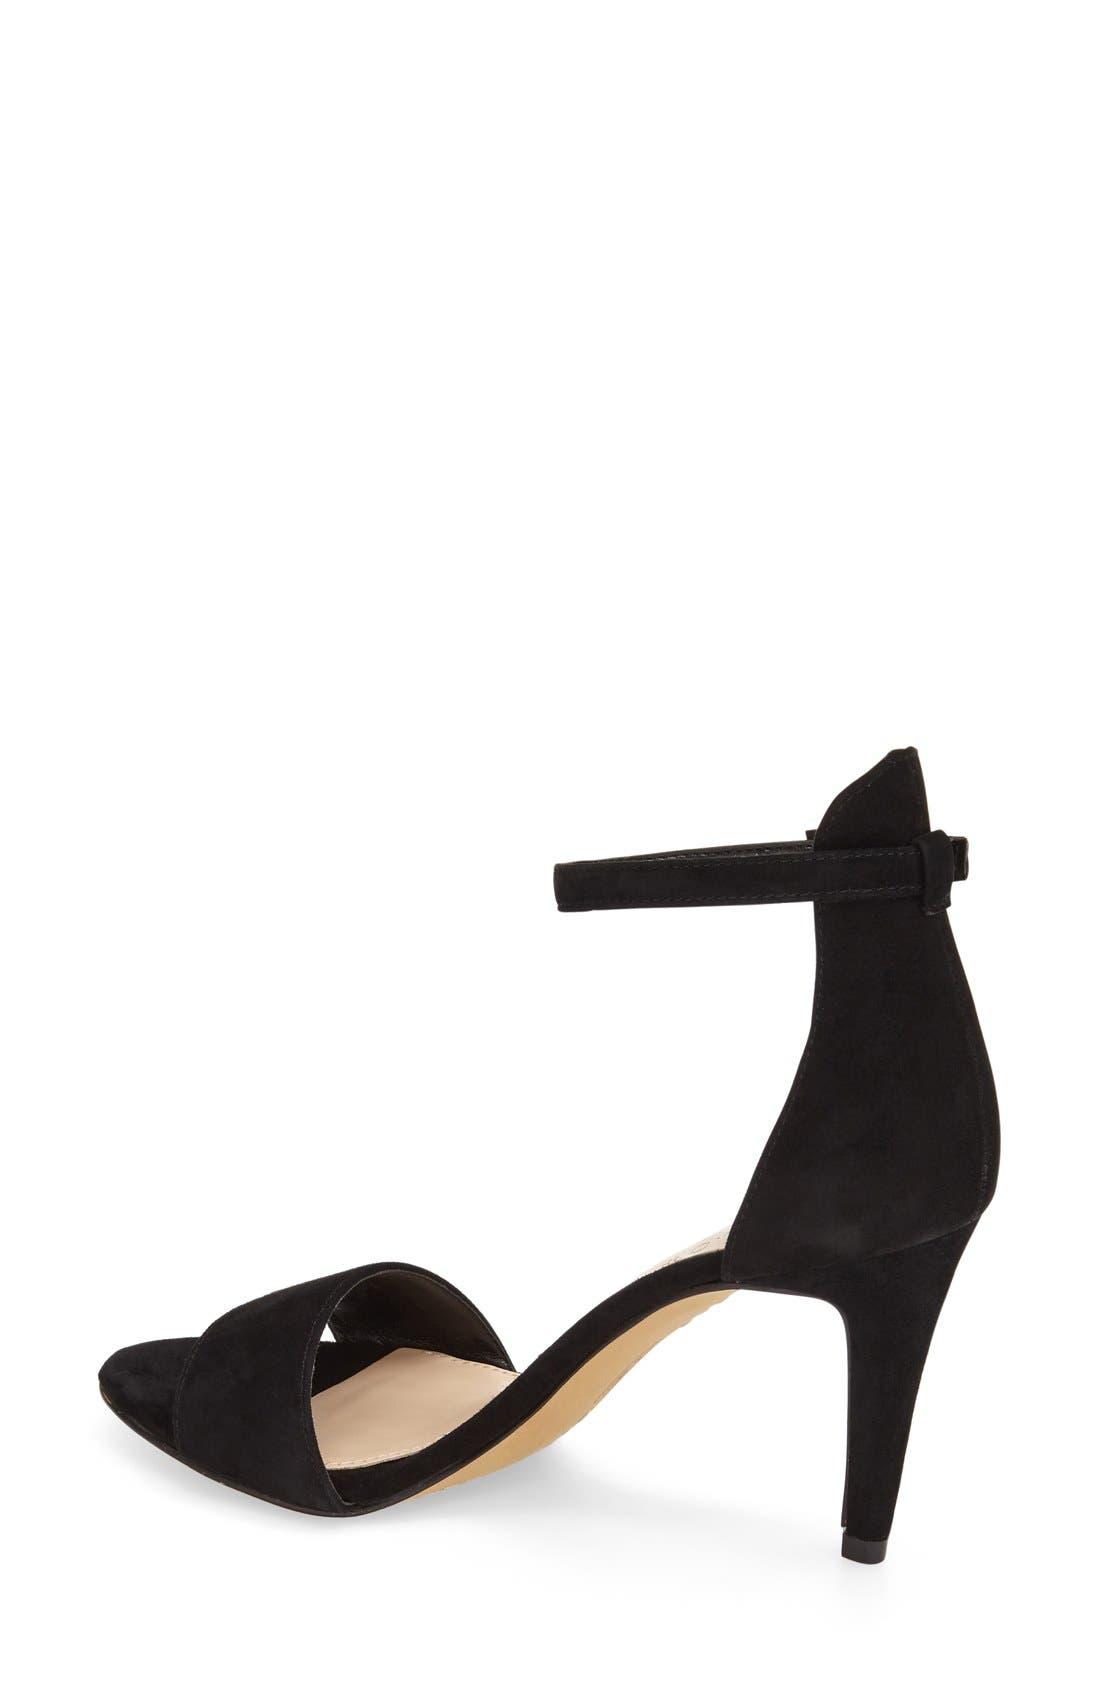 ,                             'Court' Ankle Strap Sandal,                             Alternate thumbnail 17, color,                             004